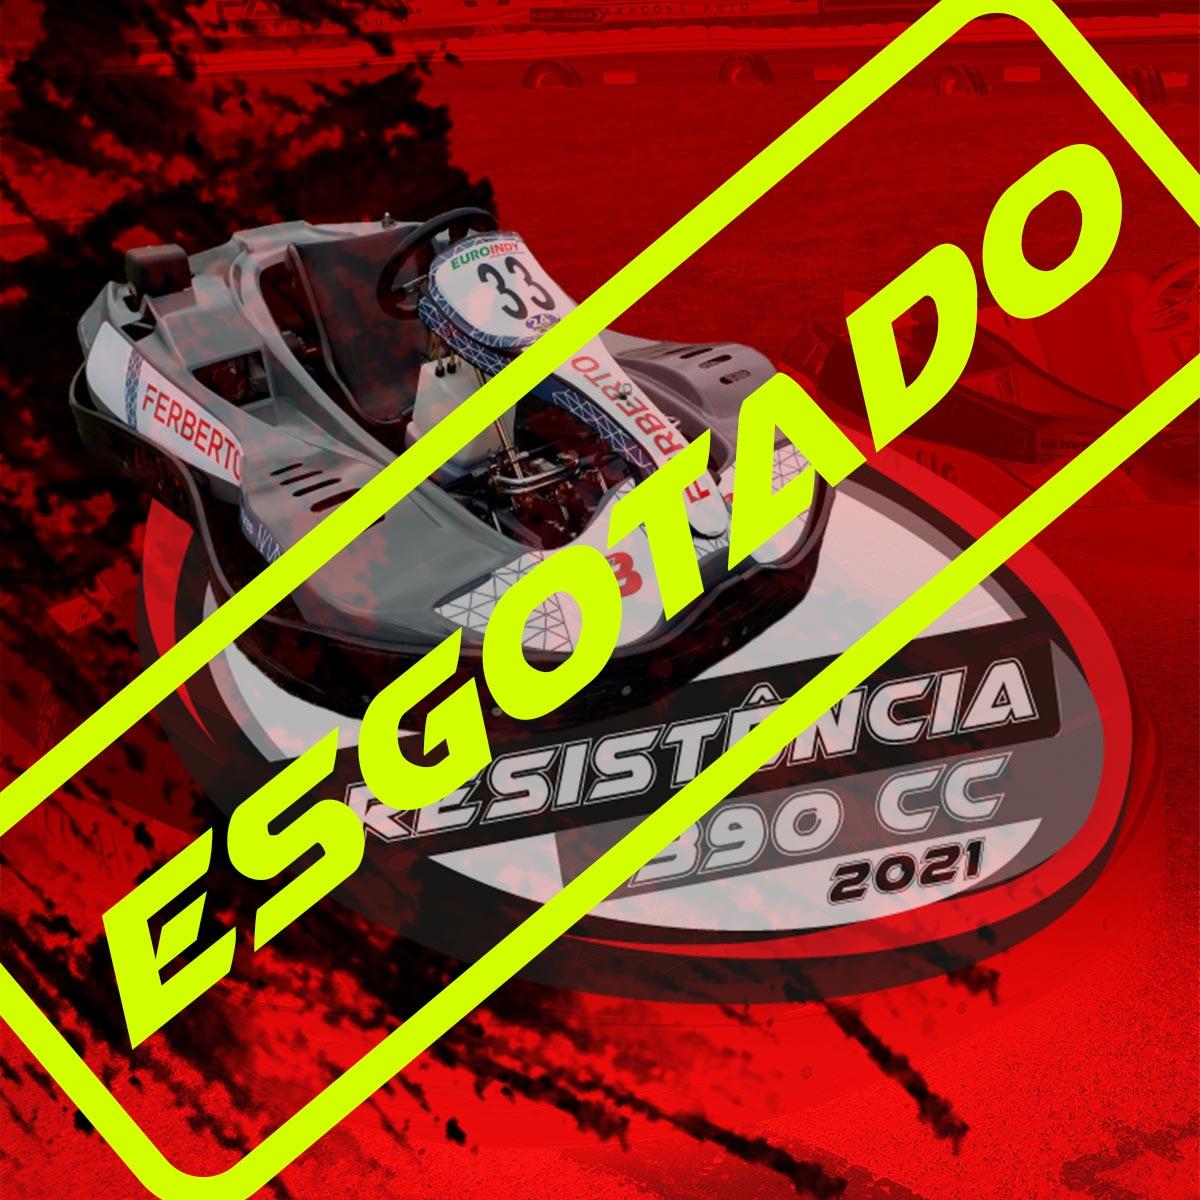 Resistência 390cc